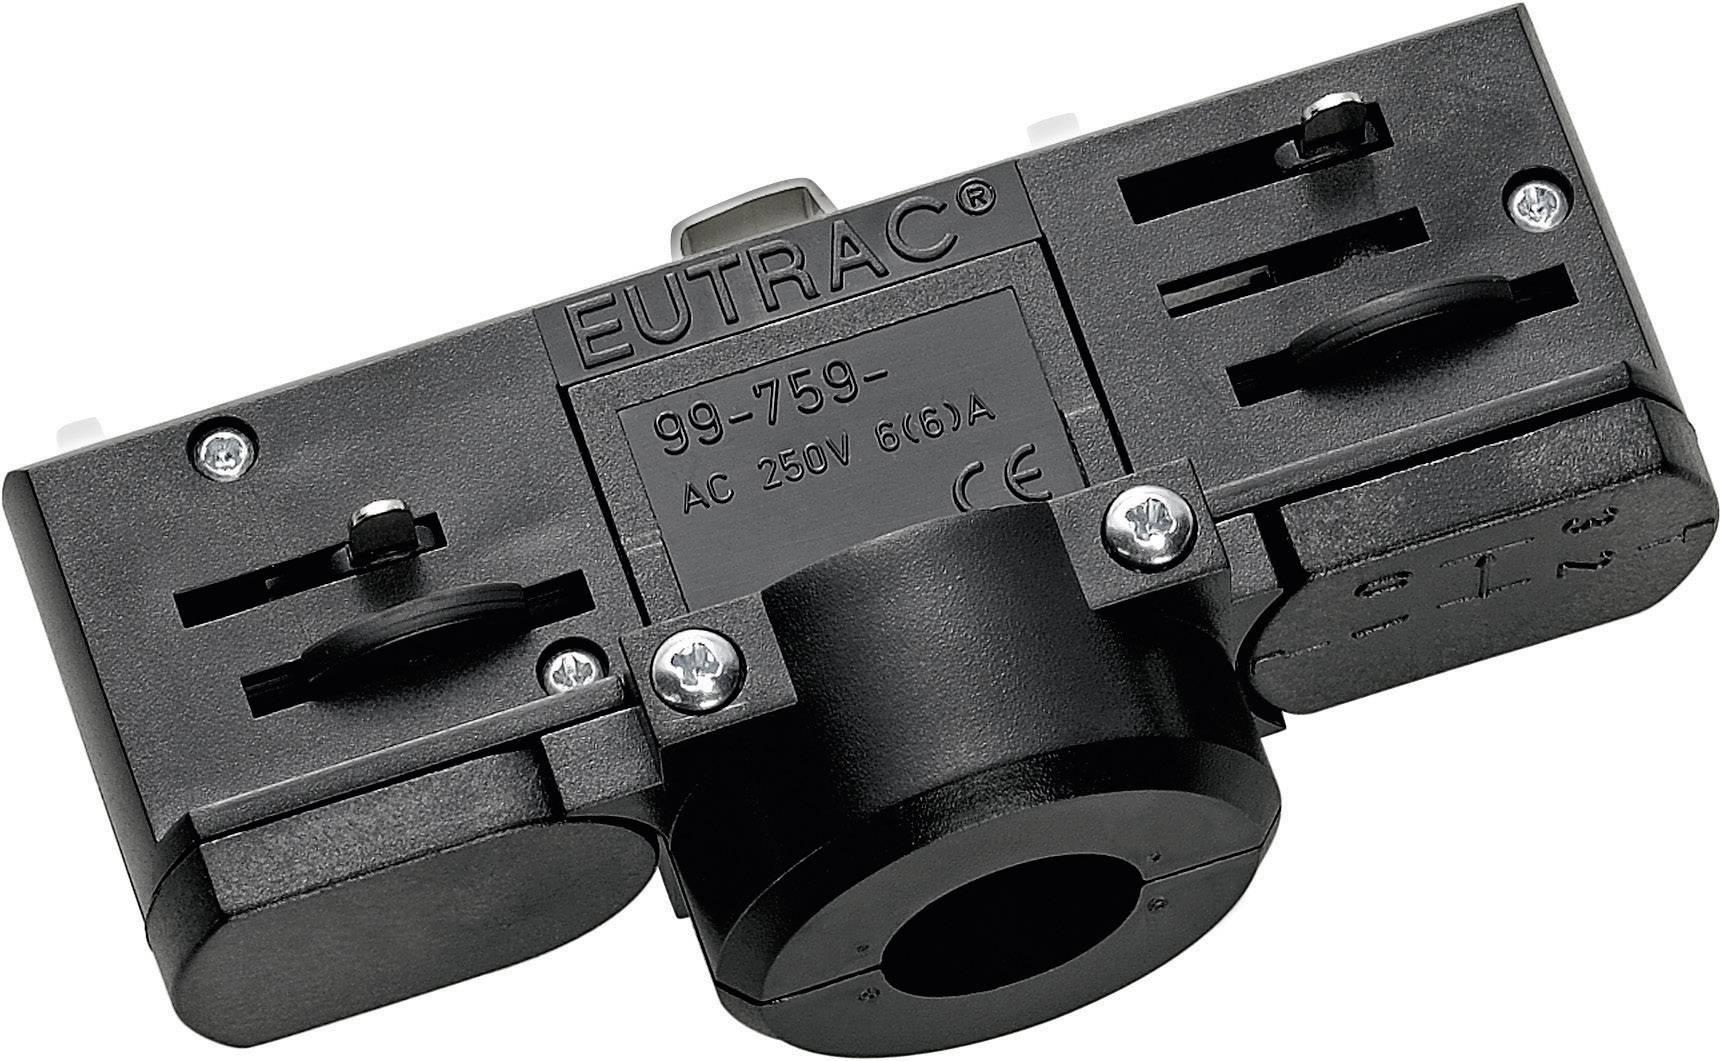 Adaptér lišty - vysokonapěť. komponent lištových systémů Eutrac 145991, bílá